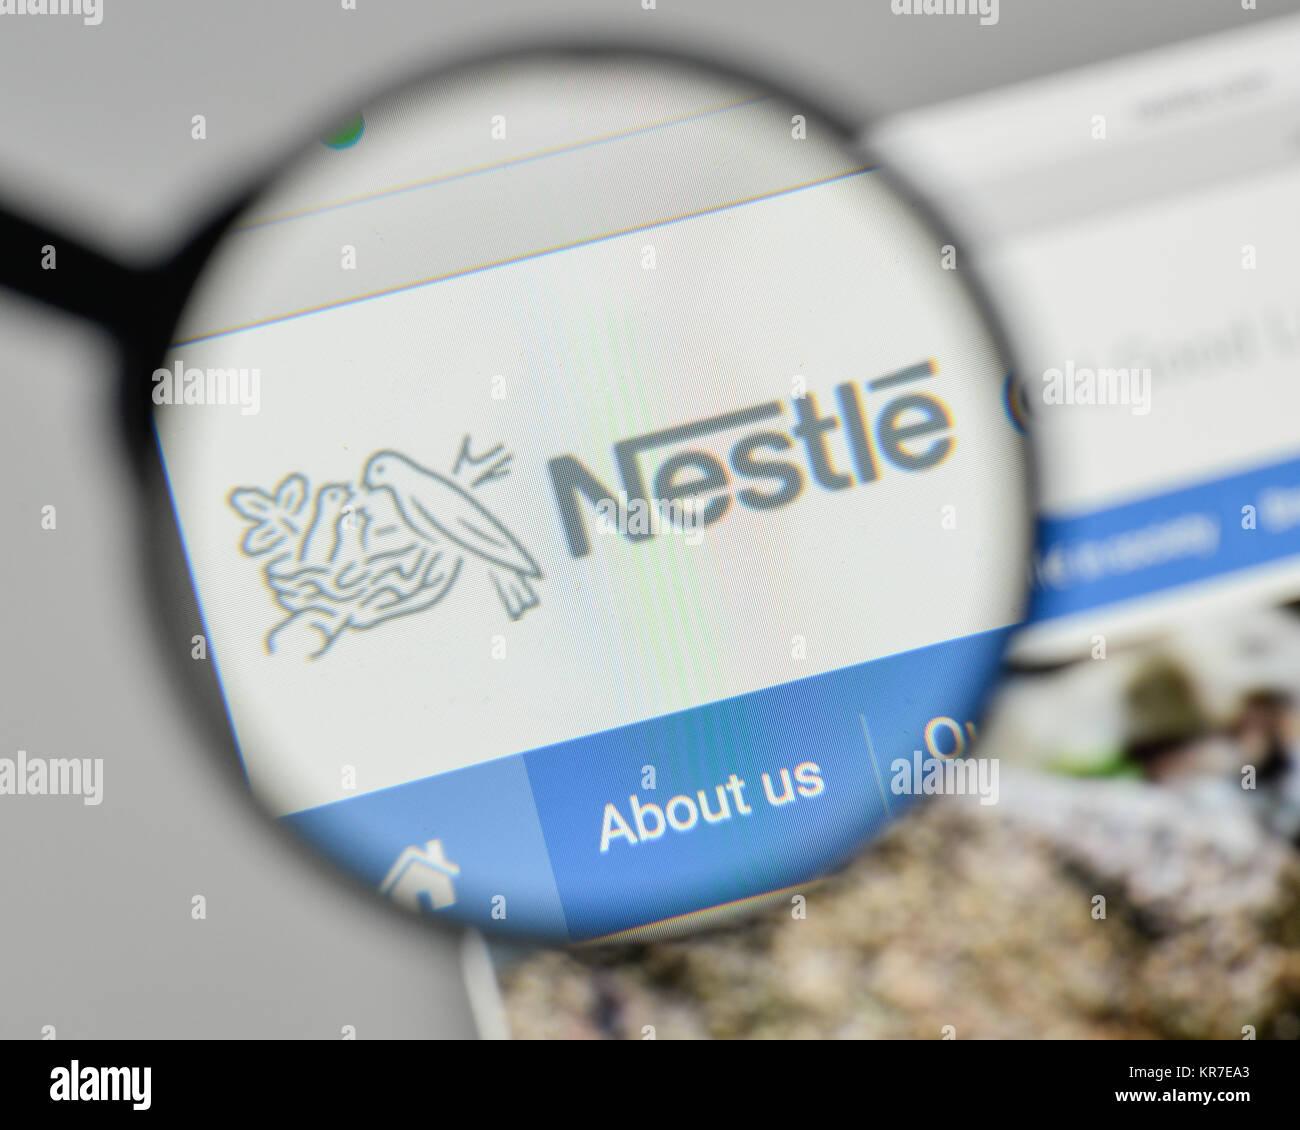 Milan, Italy - November 1, 2017: Nestle logo on the website homepage